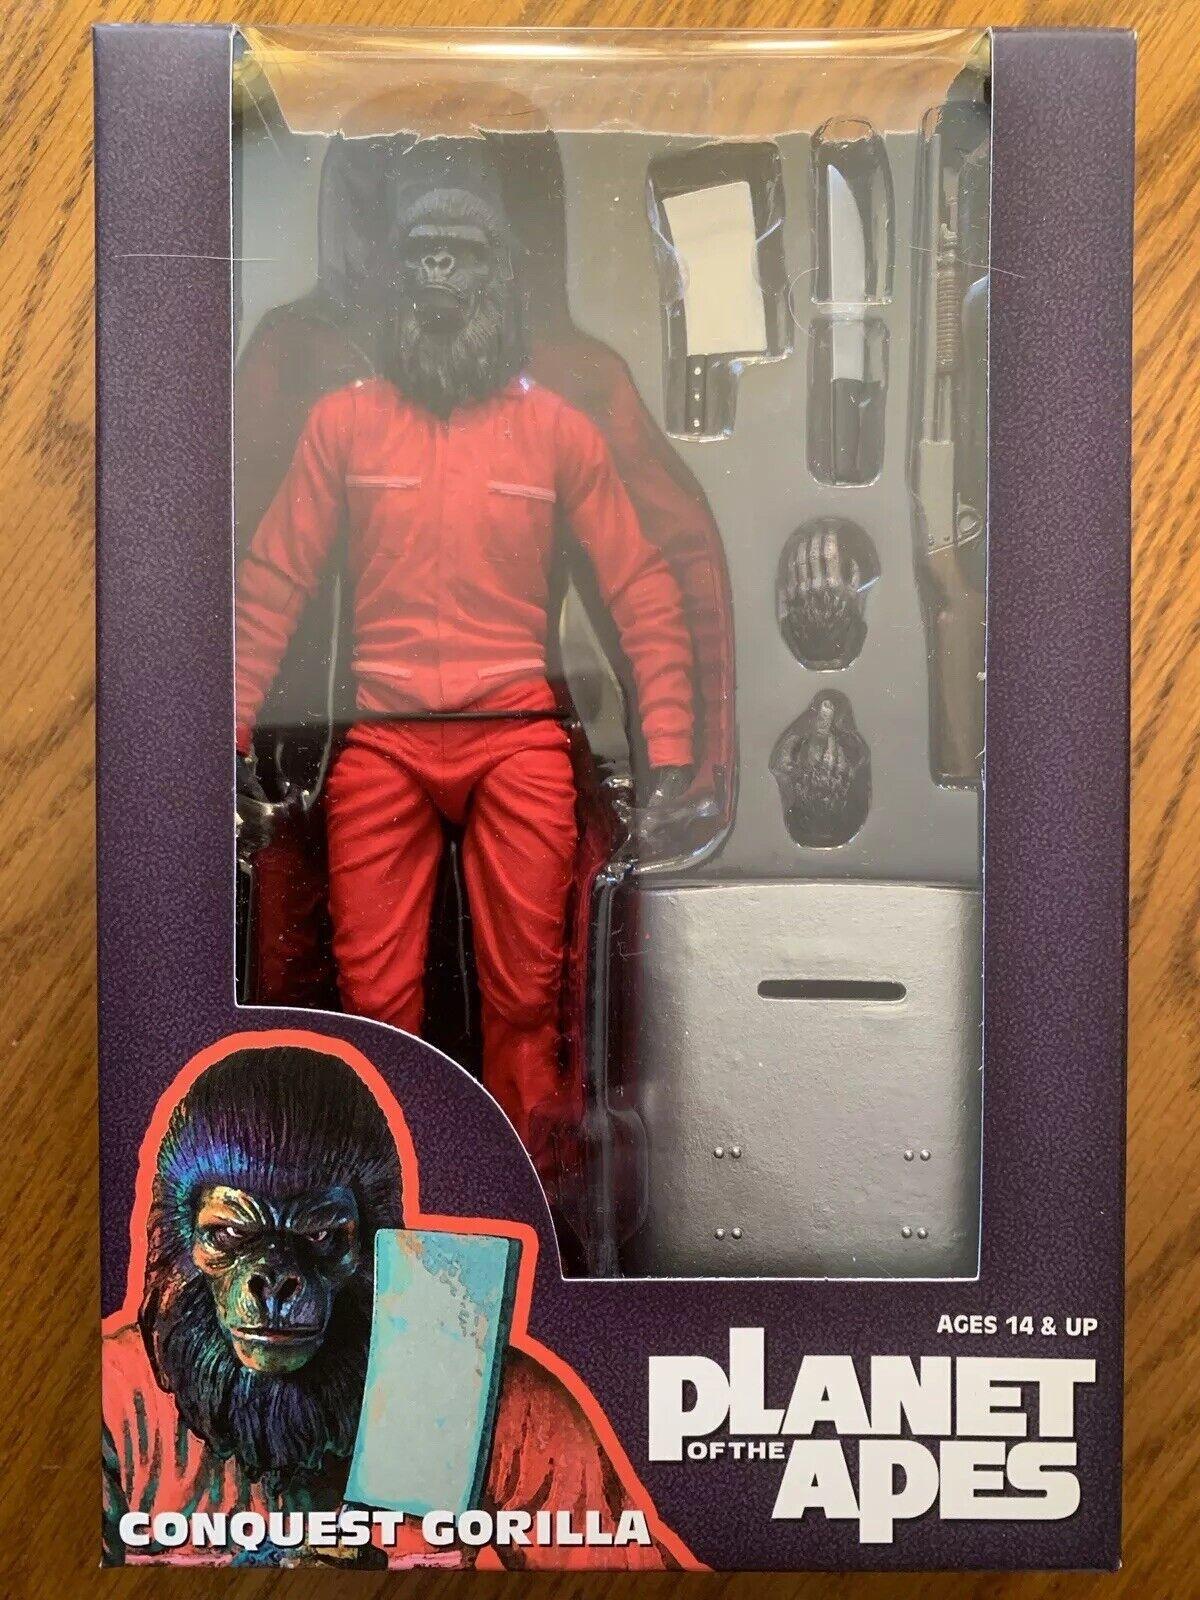 NECA Planeta De Los Simios Classic conquista Gorila San Diego comic-con 2015 Exclusivo